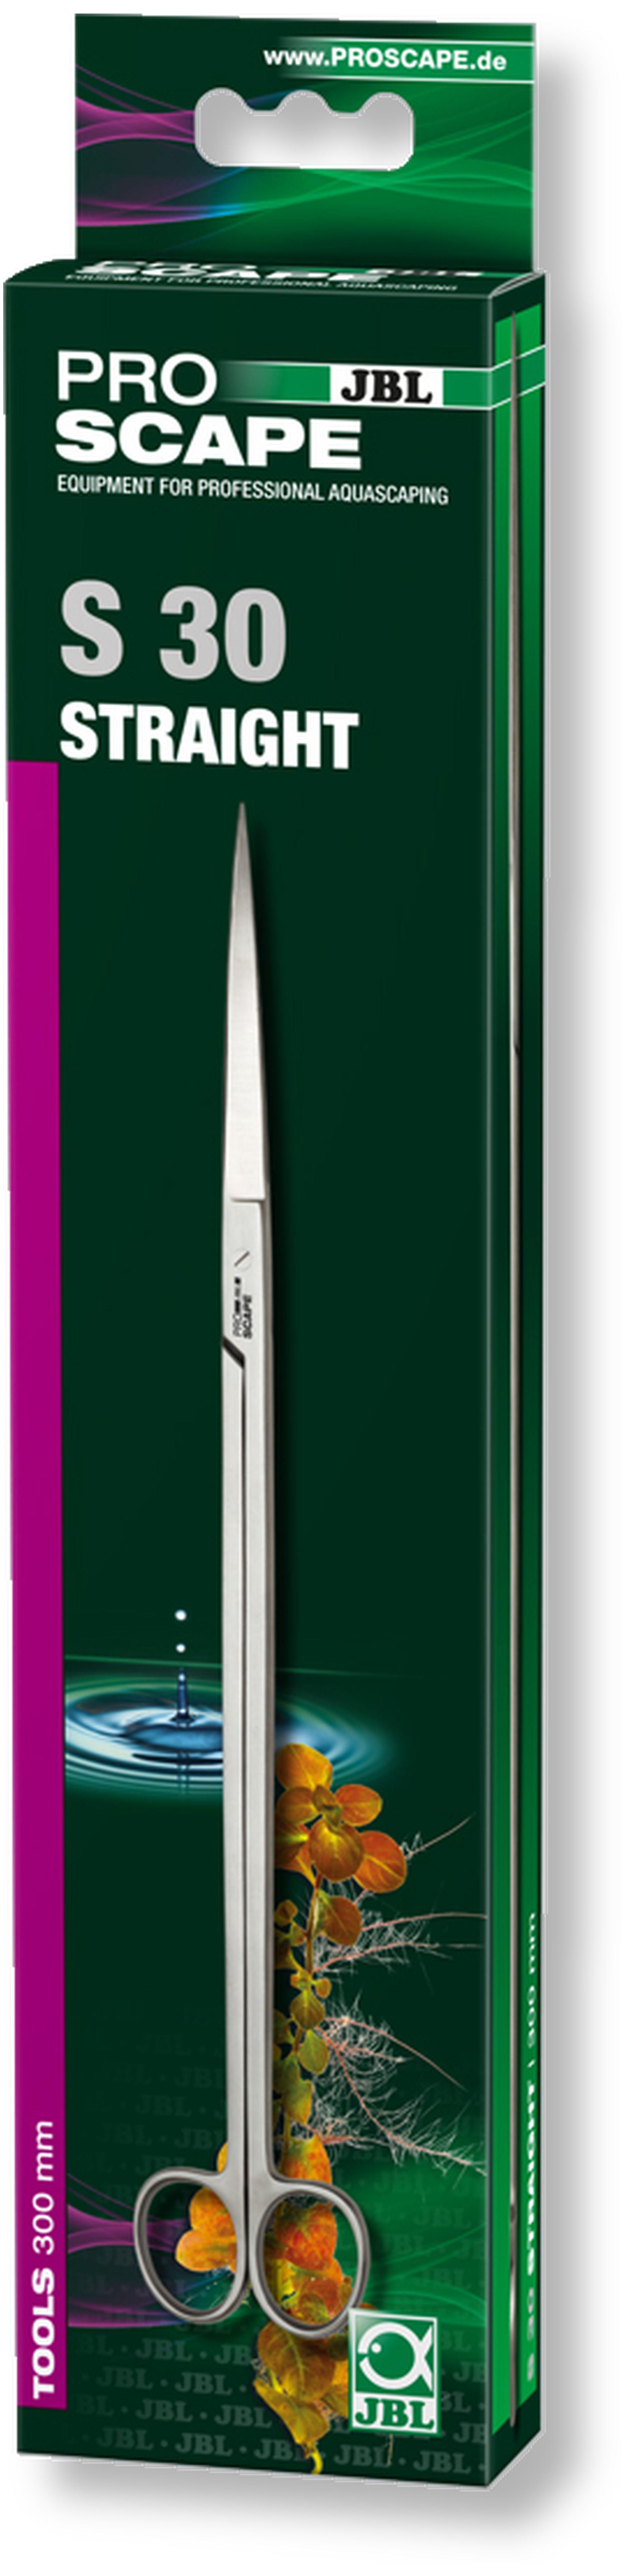 Ножницы JBL ProScape Tool S straight прямые